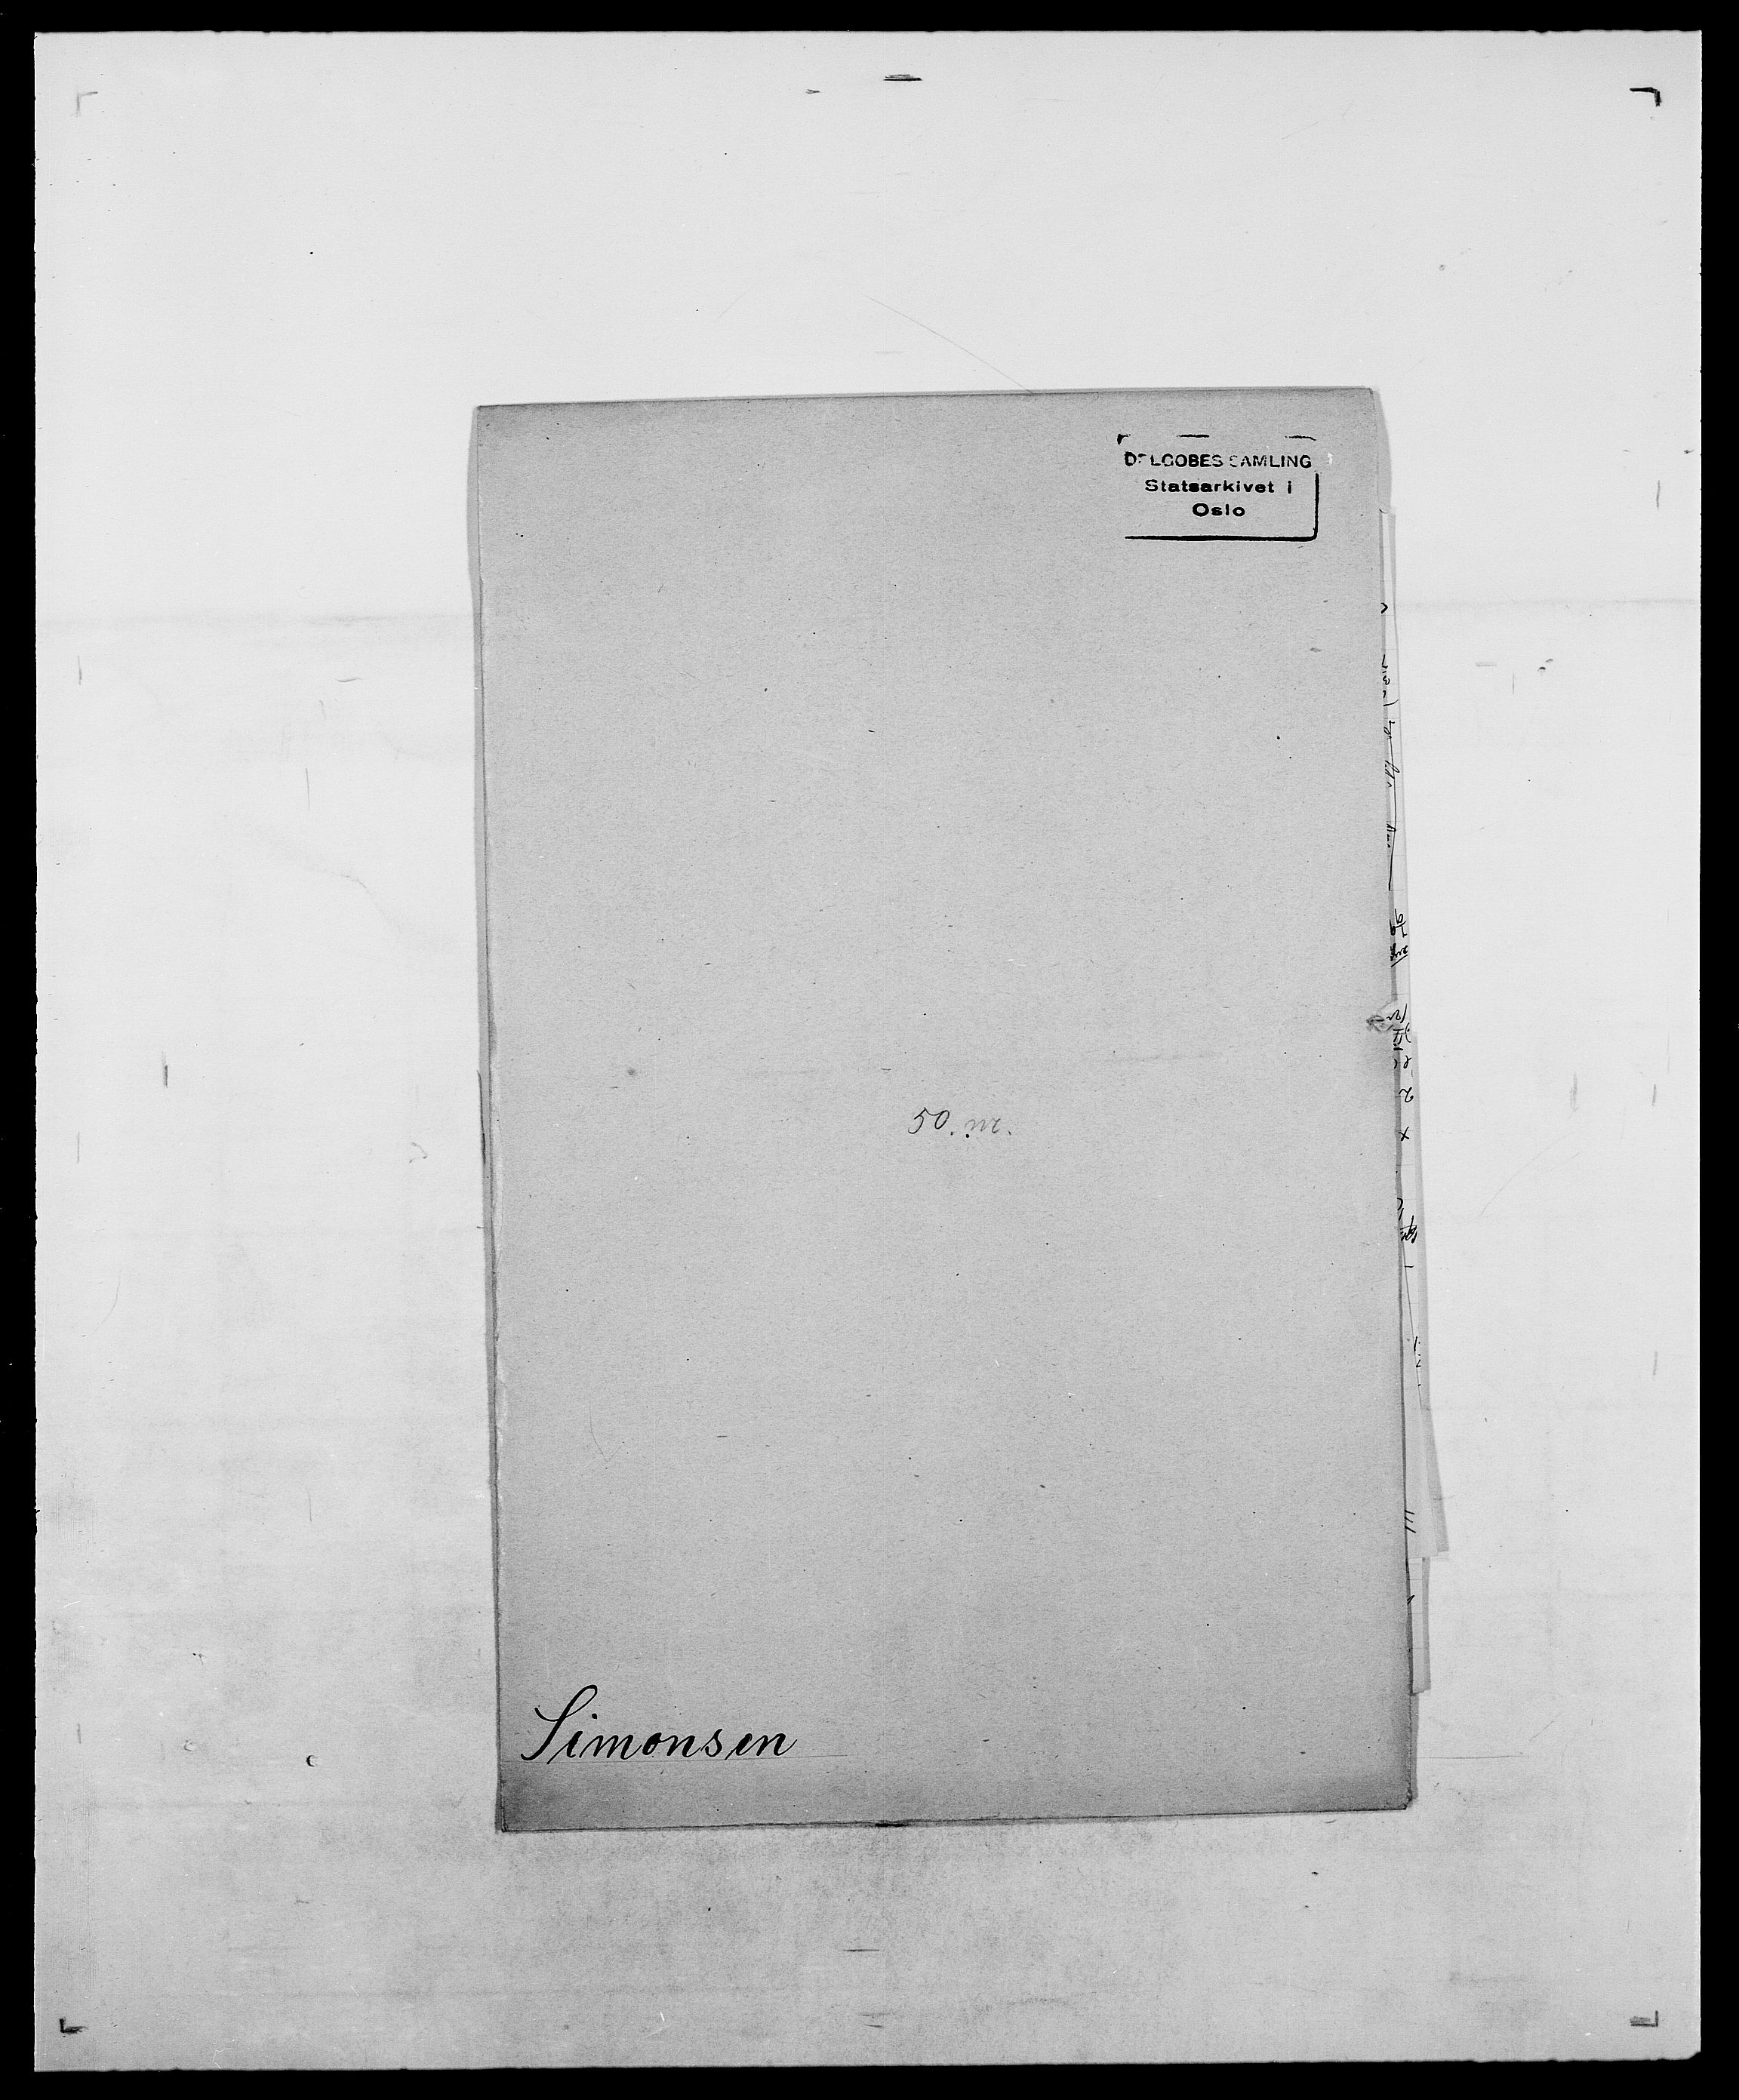 SAO, Delgobe, Charles Antoine - samling, D/Da/L0035: Schnabel - sjetman, s. 796